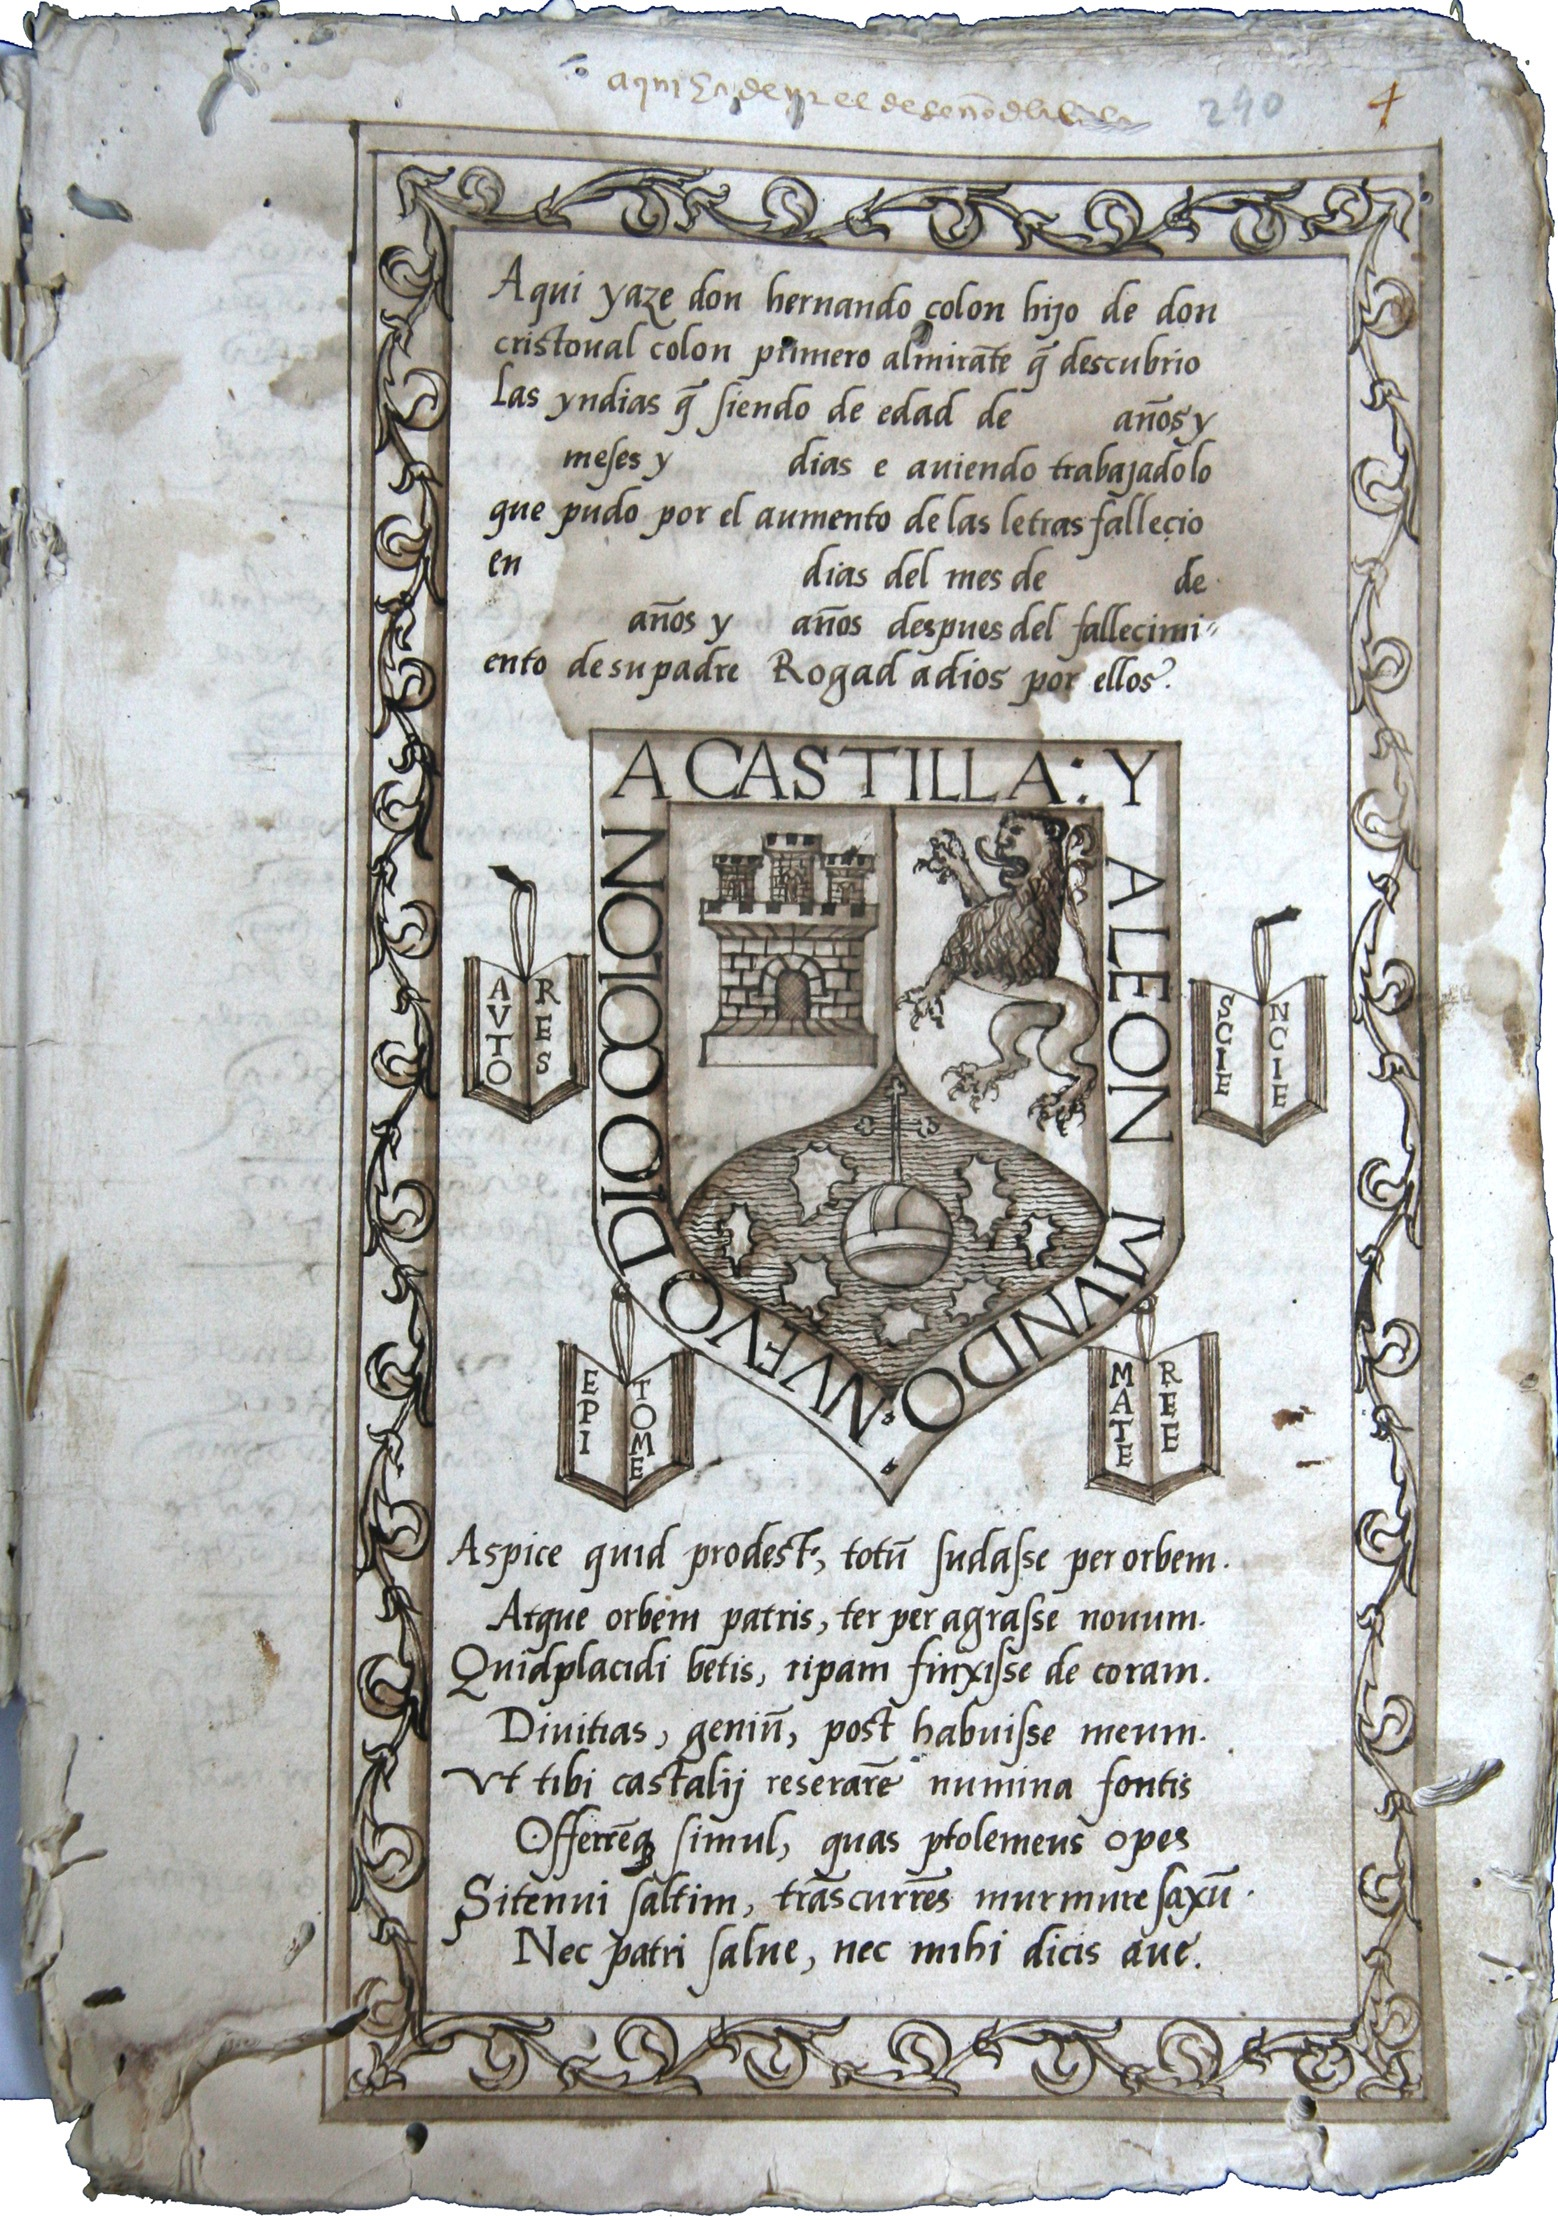 Hernando's Design for his Tomb. Reproduced with Permission from the Archivo Histórico Provincial de Sevilla